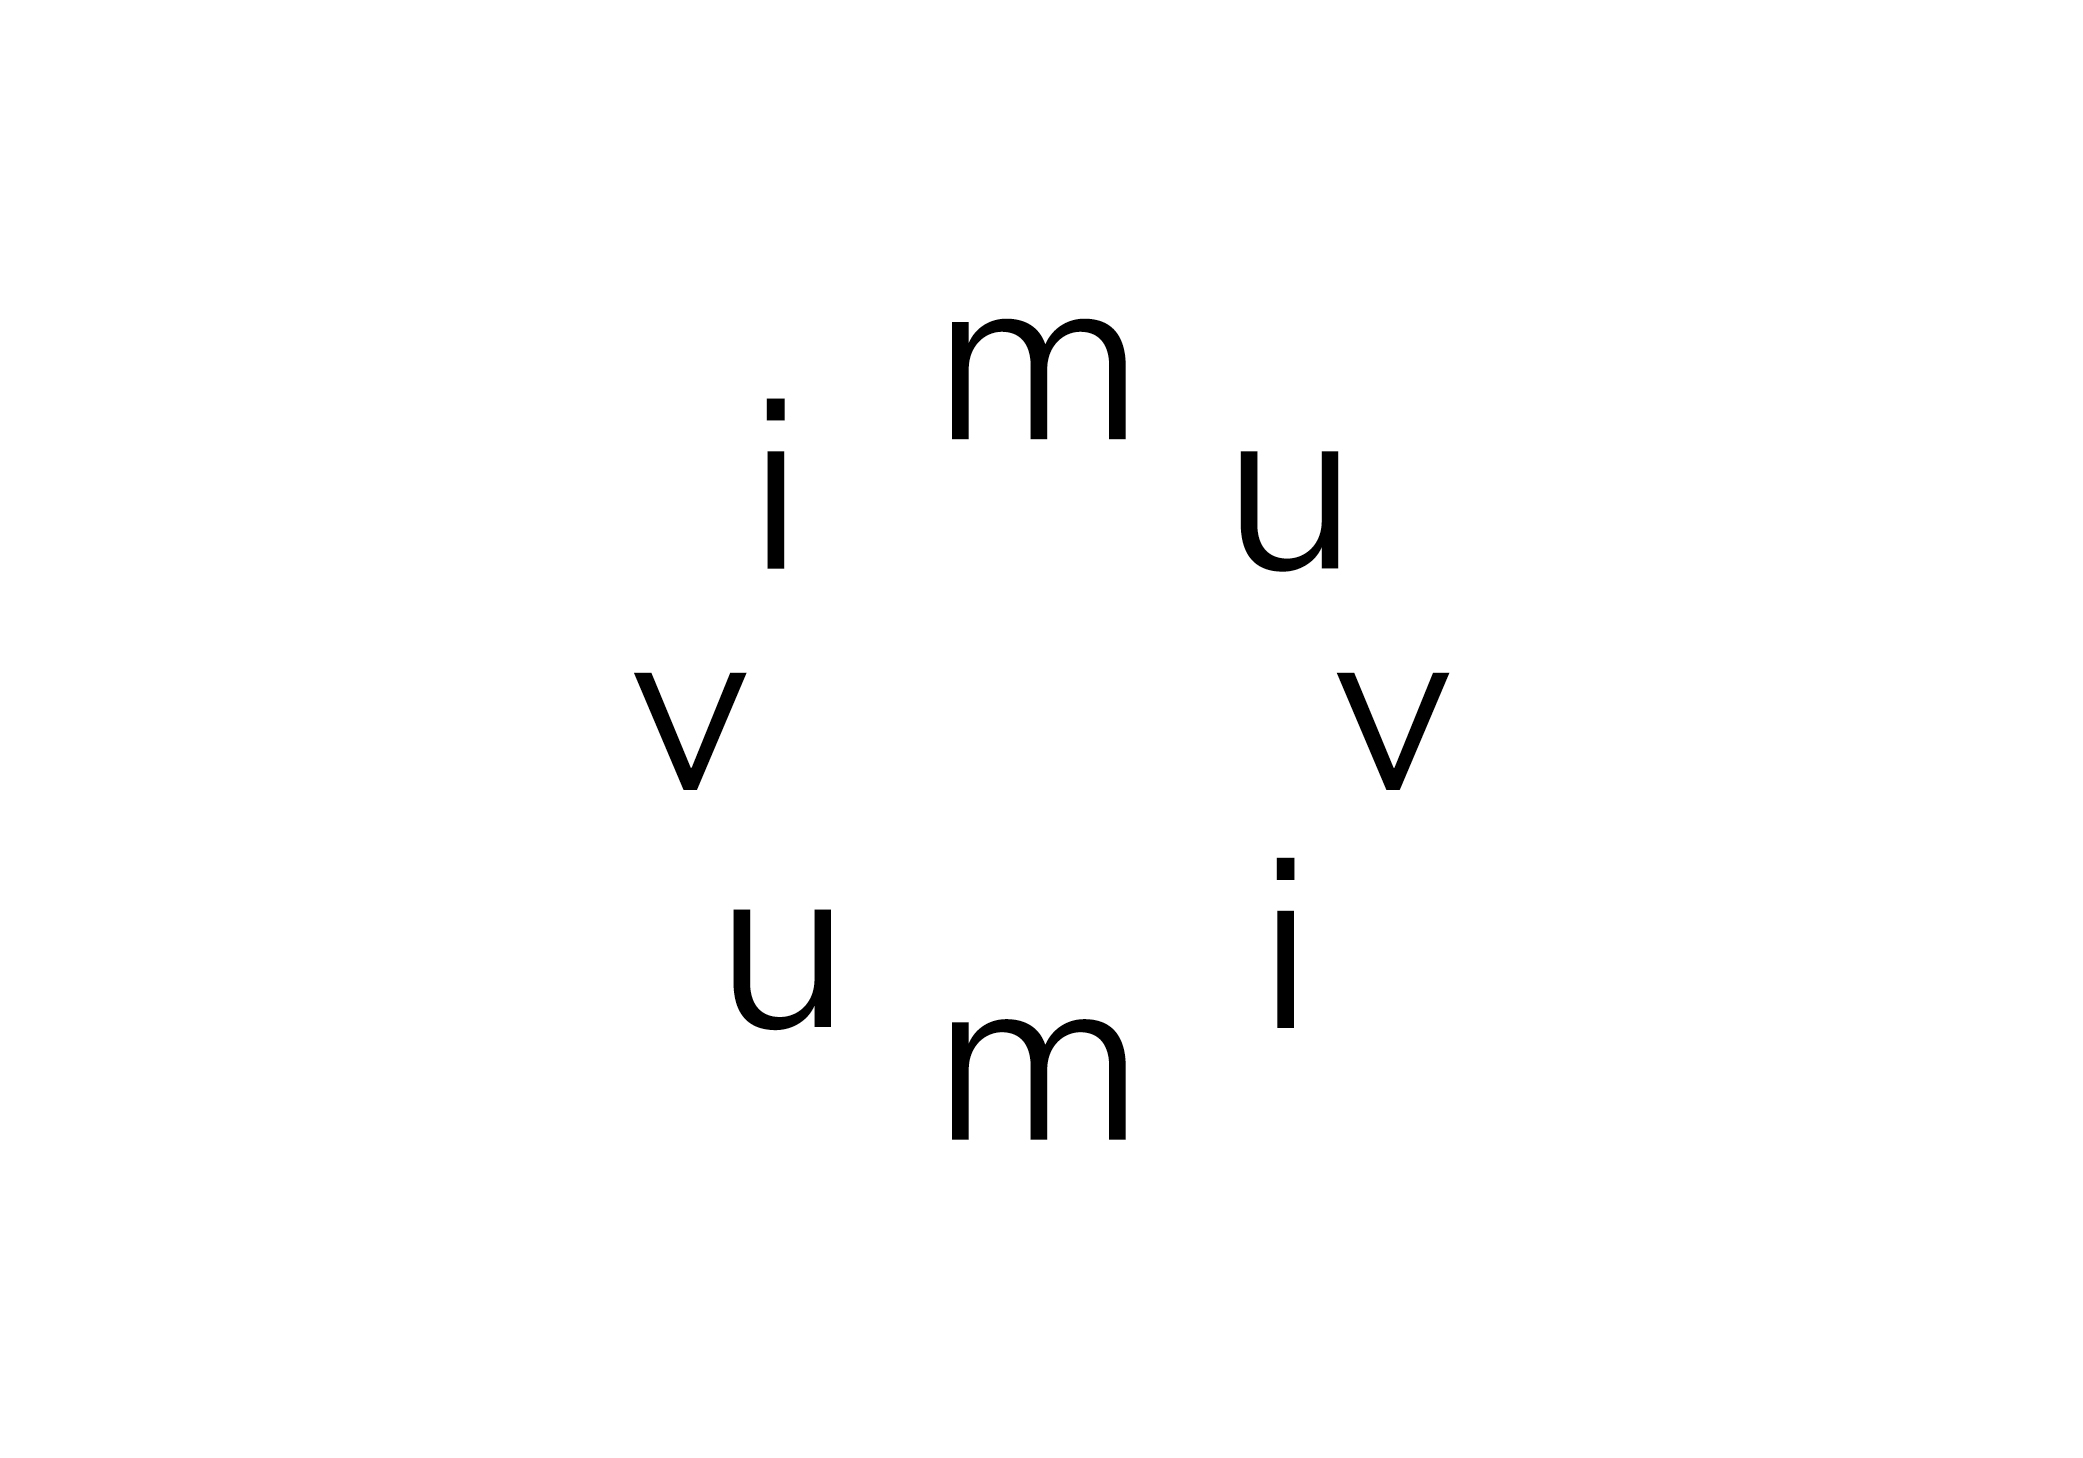 muvim — Rebranding Valencia's Modern Art museum